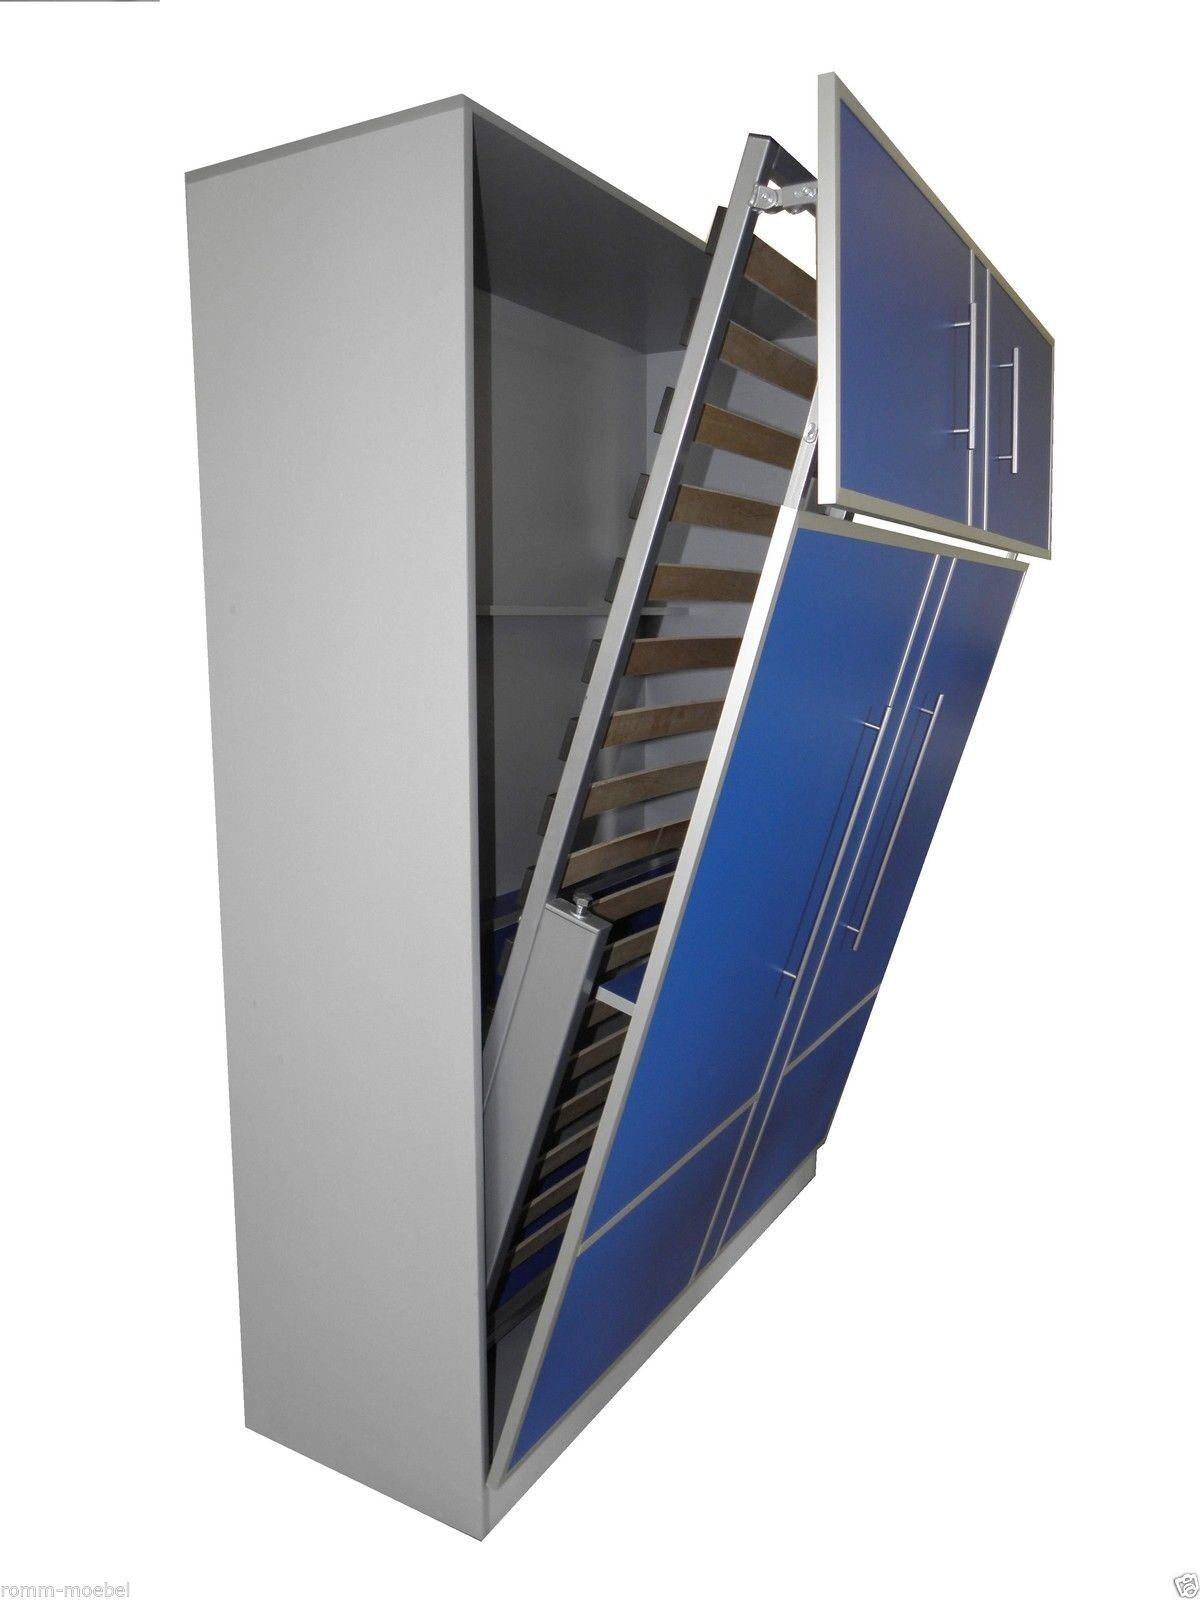 schrankbett wandbett klappbett 50 w 2 90x200 cm holzfarbe. Black Bedroom Furniture Sets. Home Design Ideas